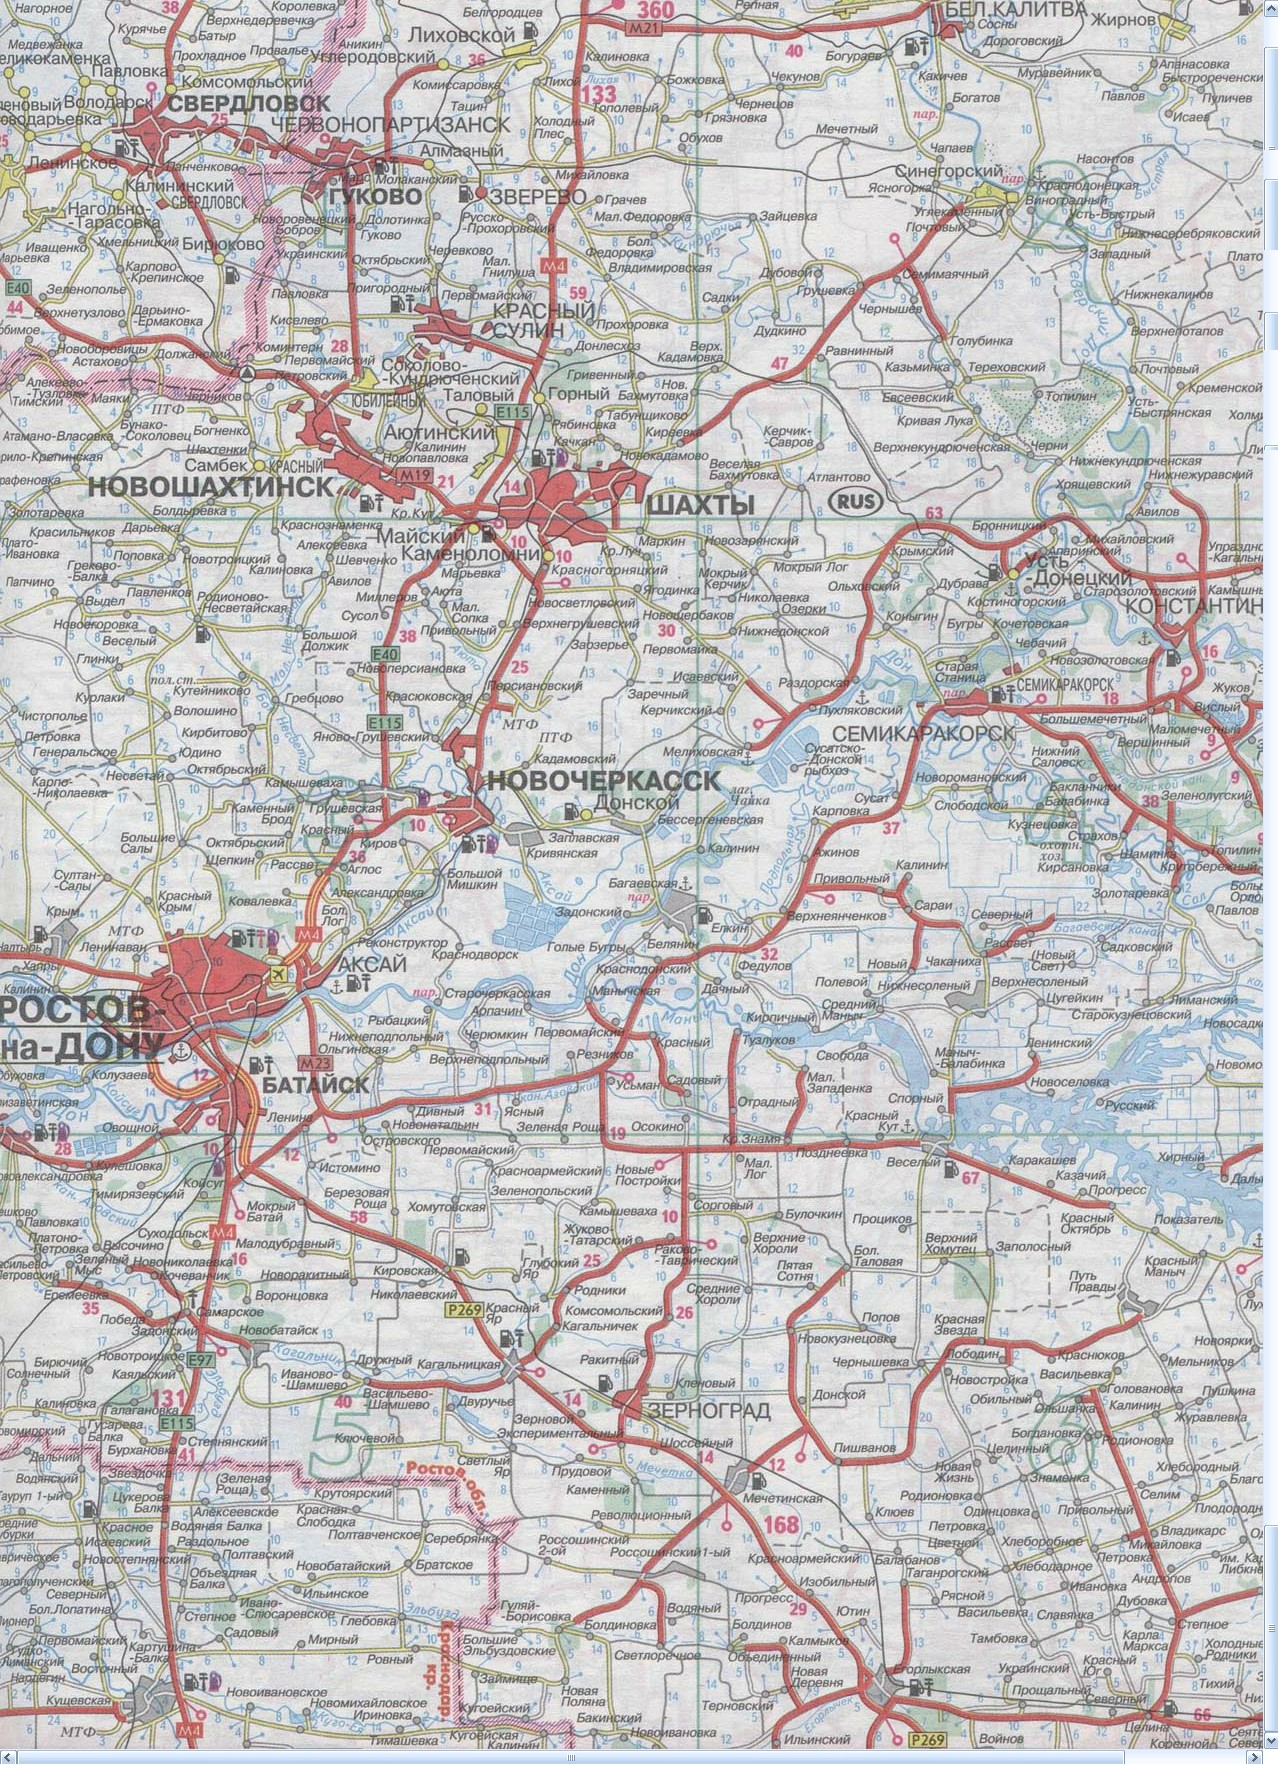 Карта Зерноград, Шахтинск, Ростов-на-Дону, Шахты